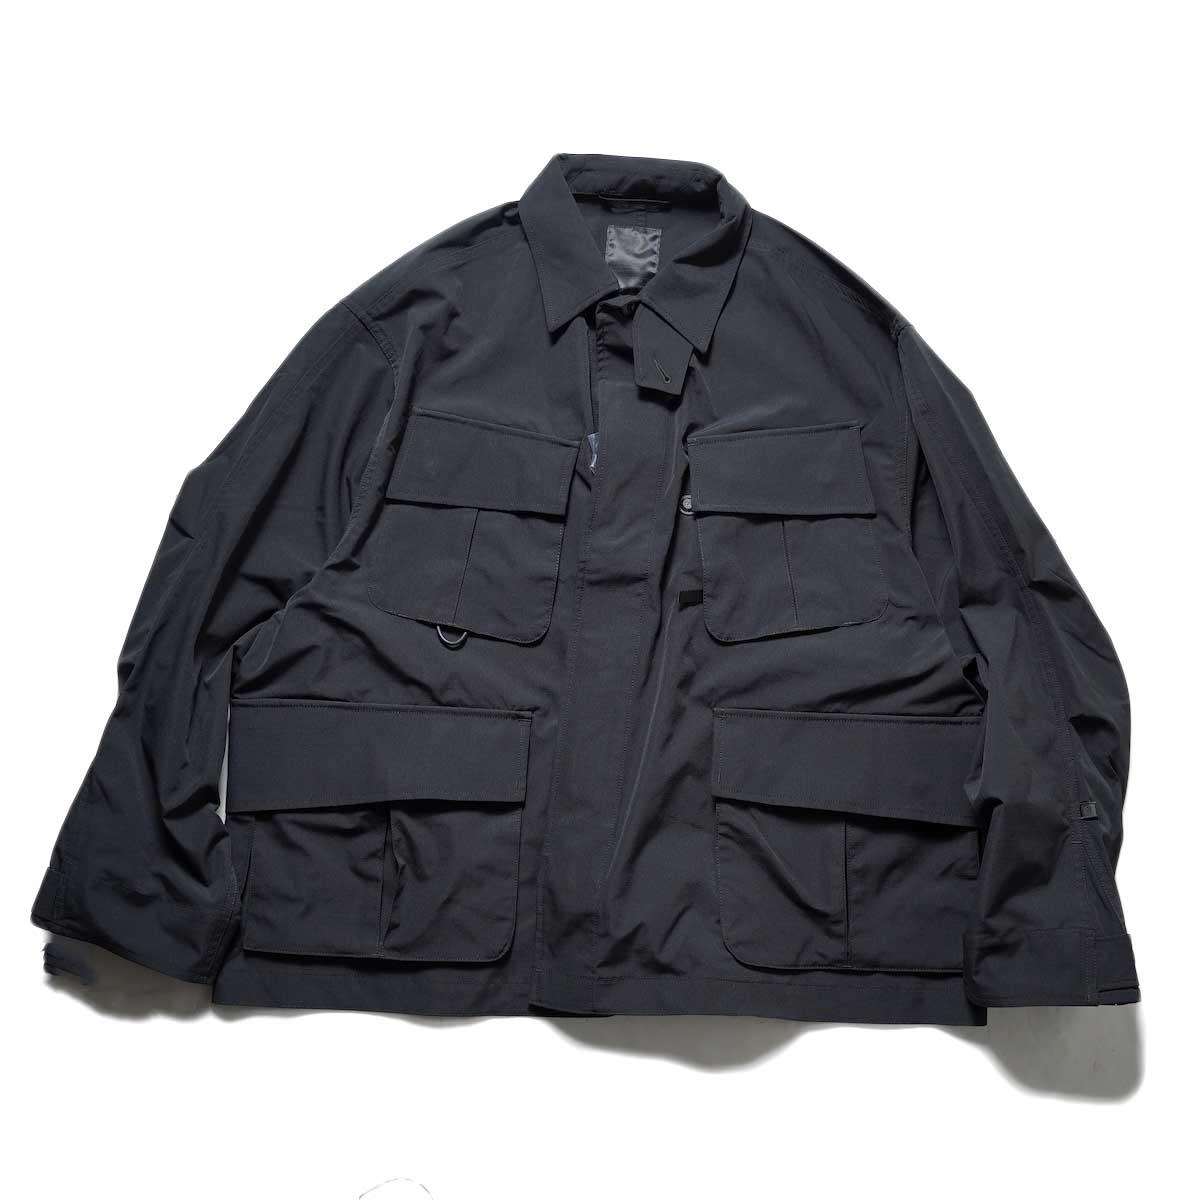 DAIWA PIER39 / Tech Jungle Fatigue Jacket (Black)